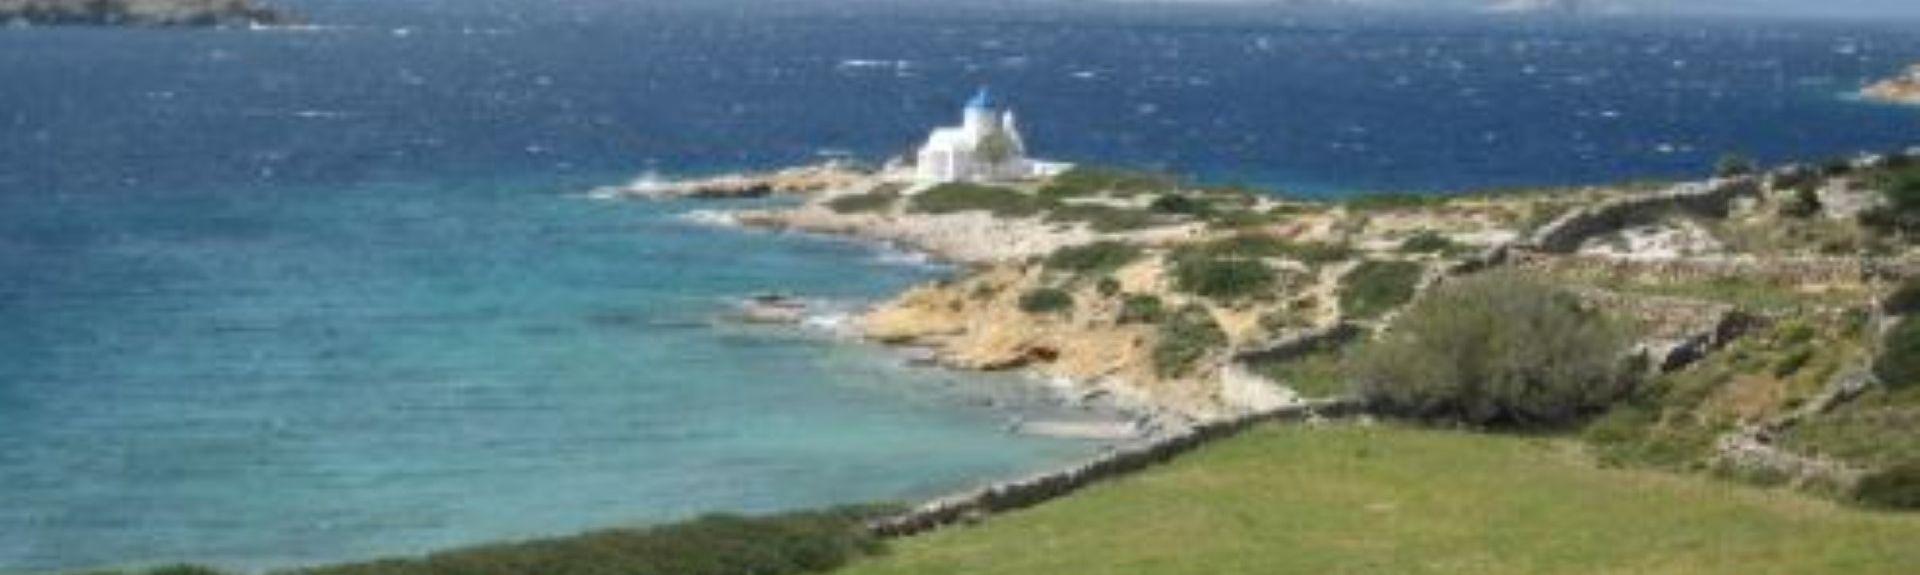 Agia Anna strand, Amorgos, Sørlige egeiske øyer, Hellas